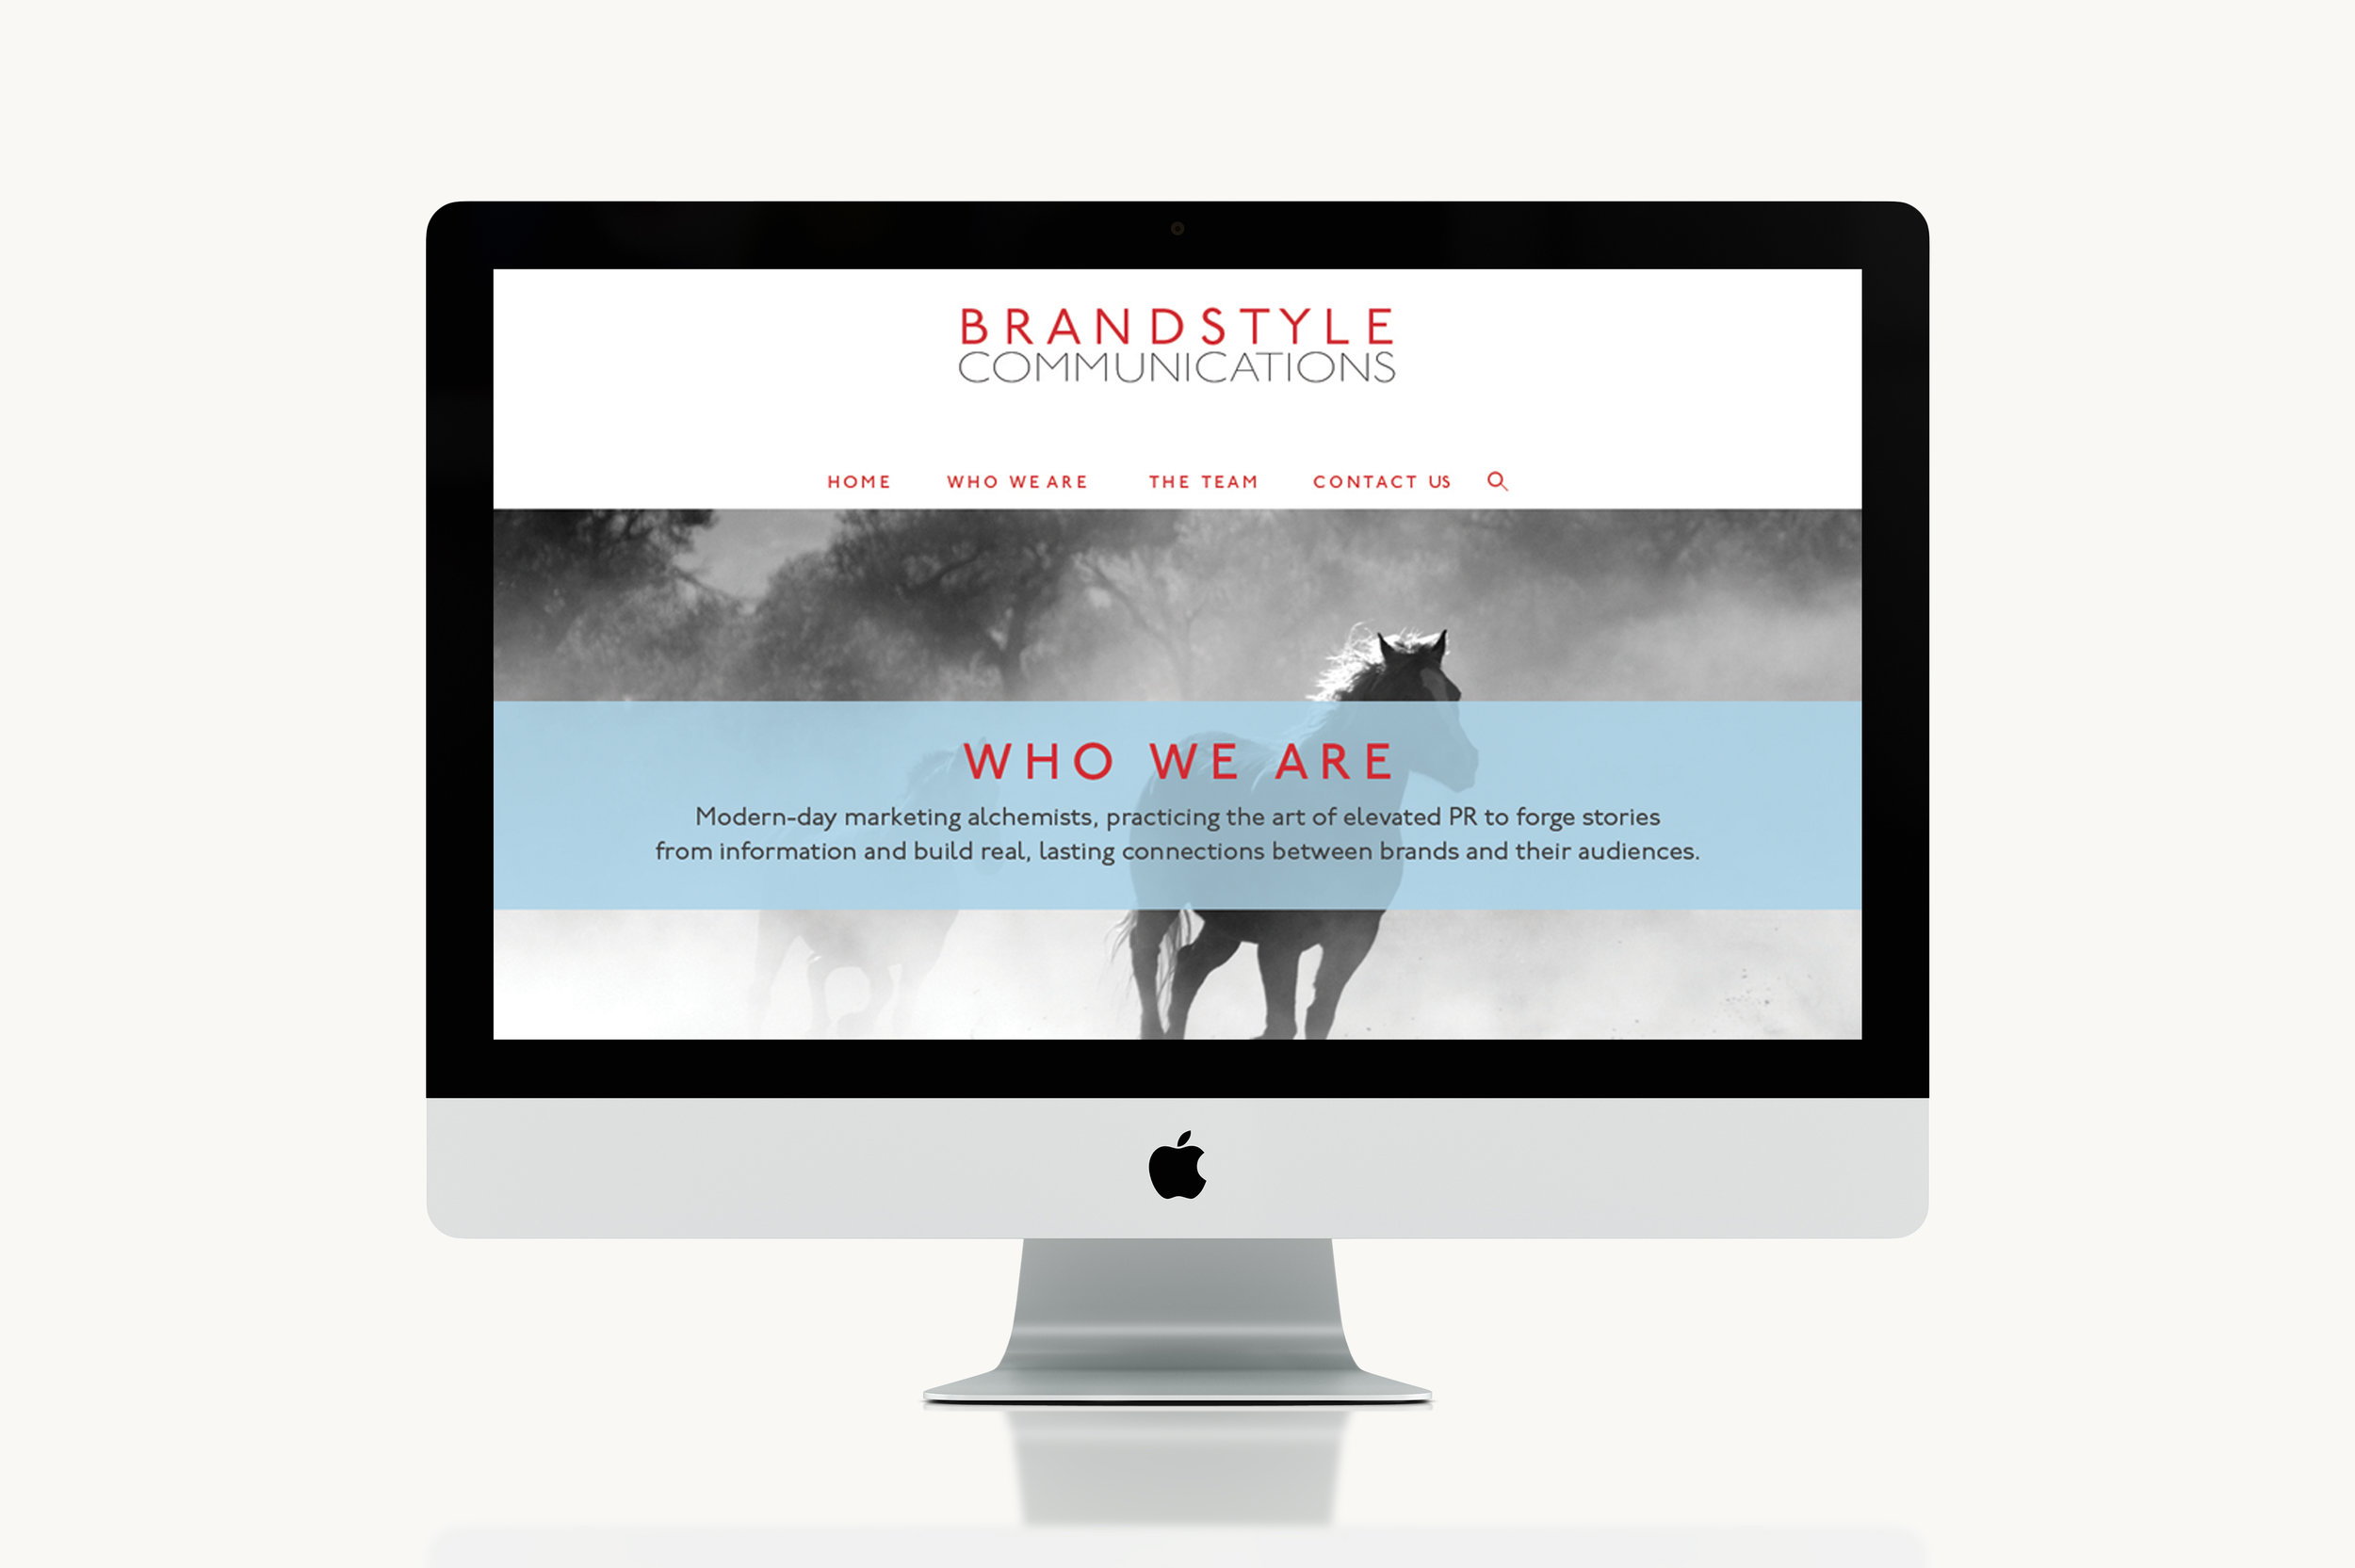 Brandstyle Communications Website Mockup - MAC desktop.jpg